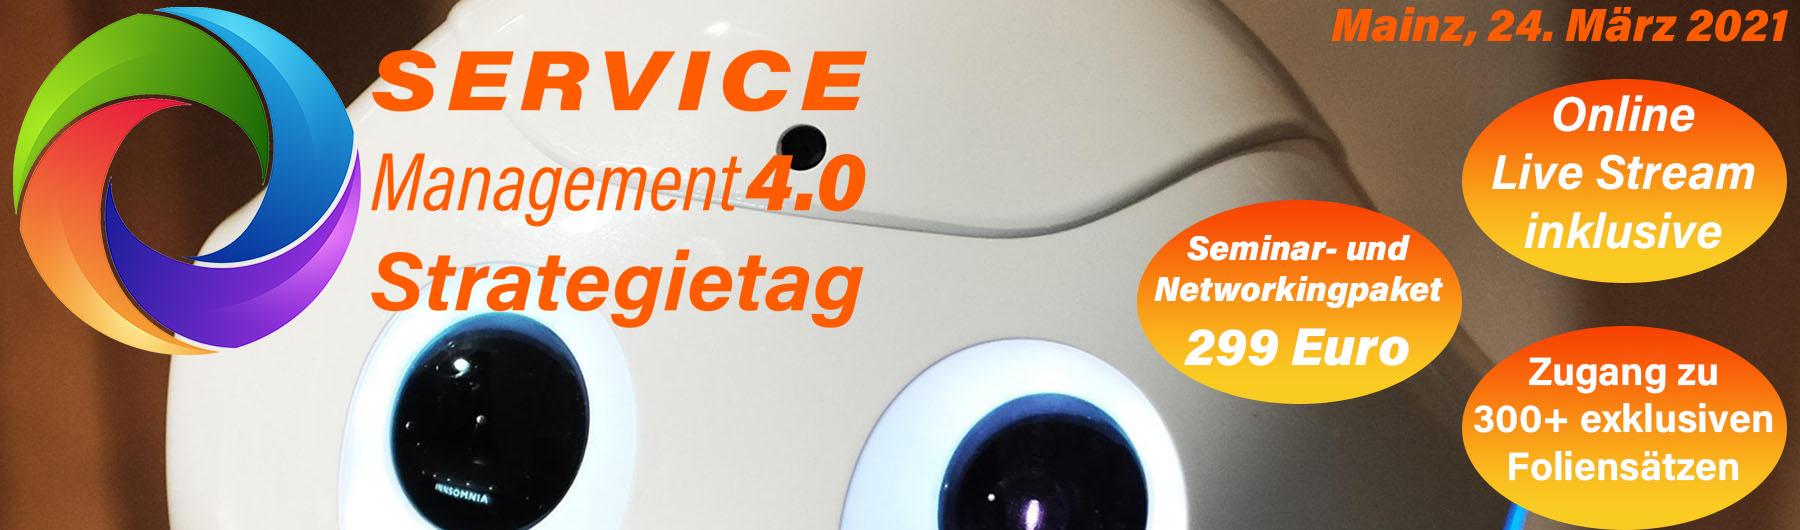 Service Management 4.0 Strategietag 2021